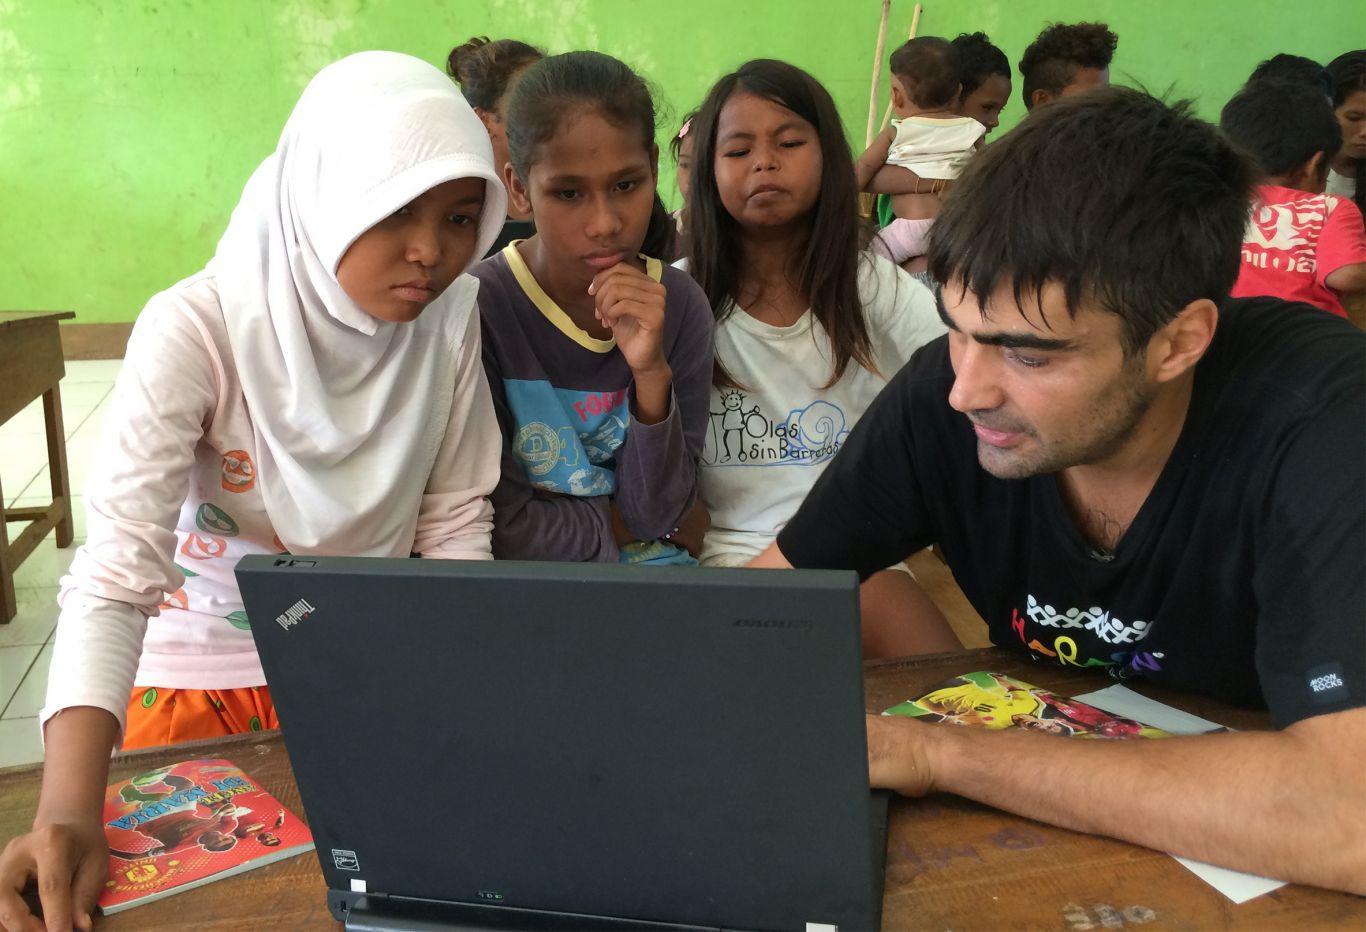 Carlos Ferrandiz saat memberikan pendidikan kepada anak-anak di desa Hu'u